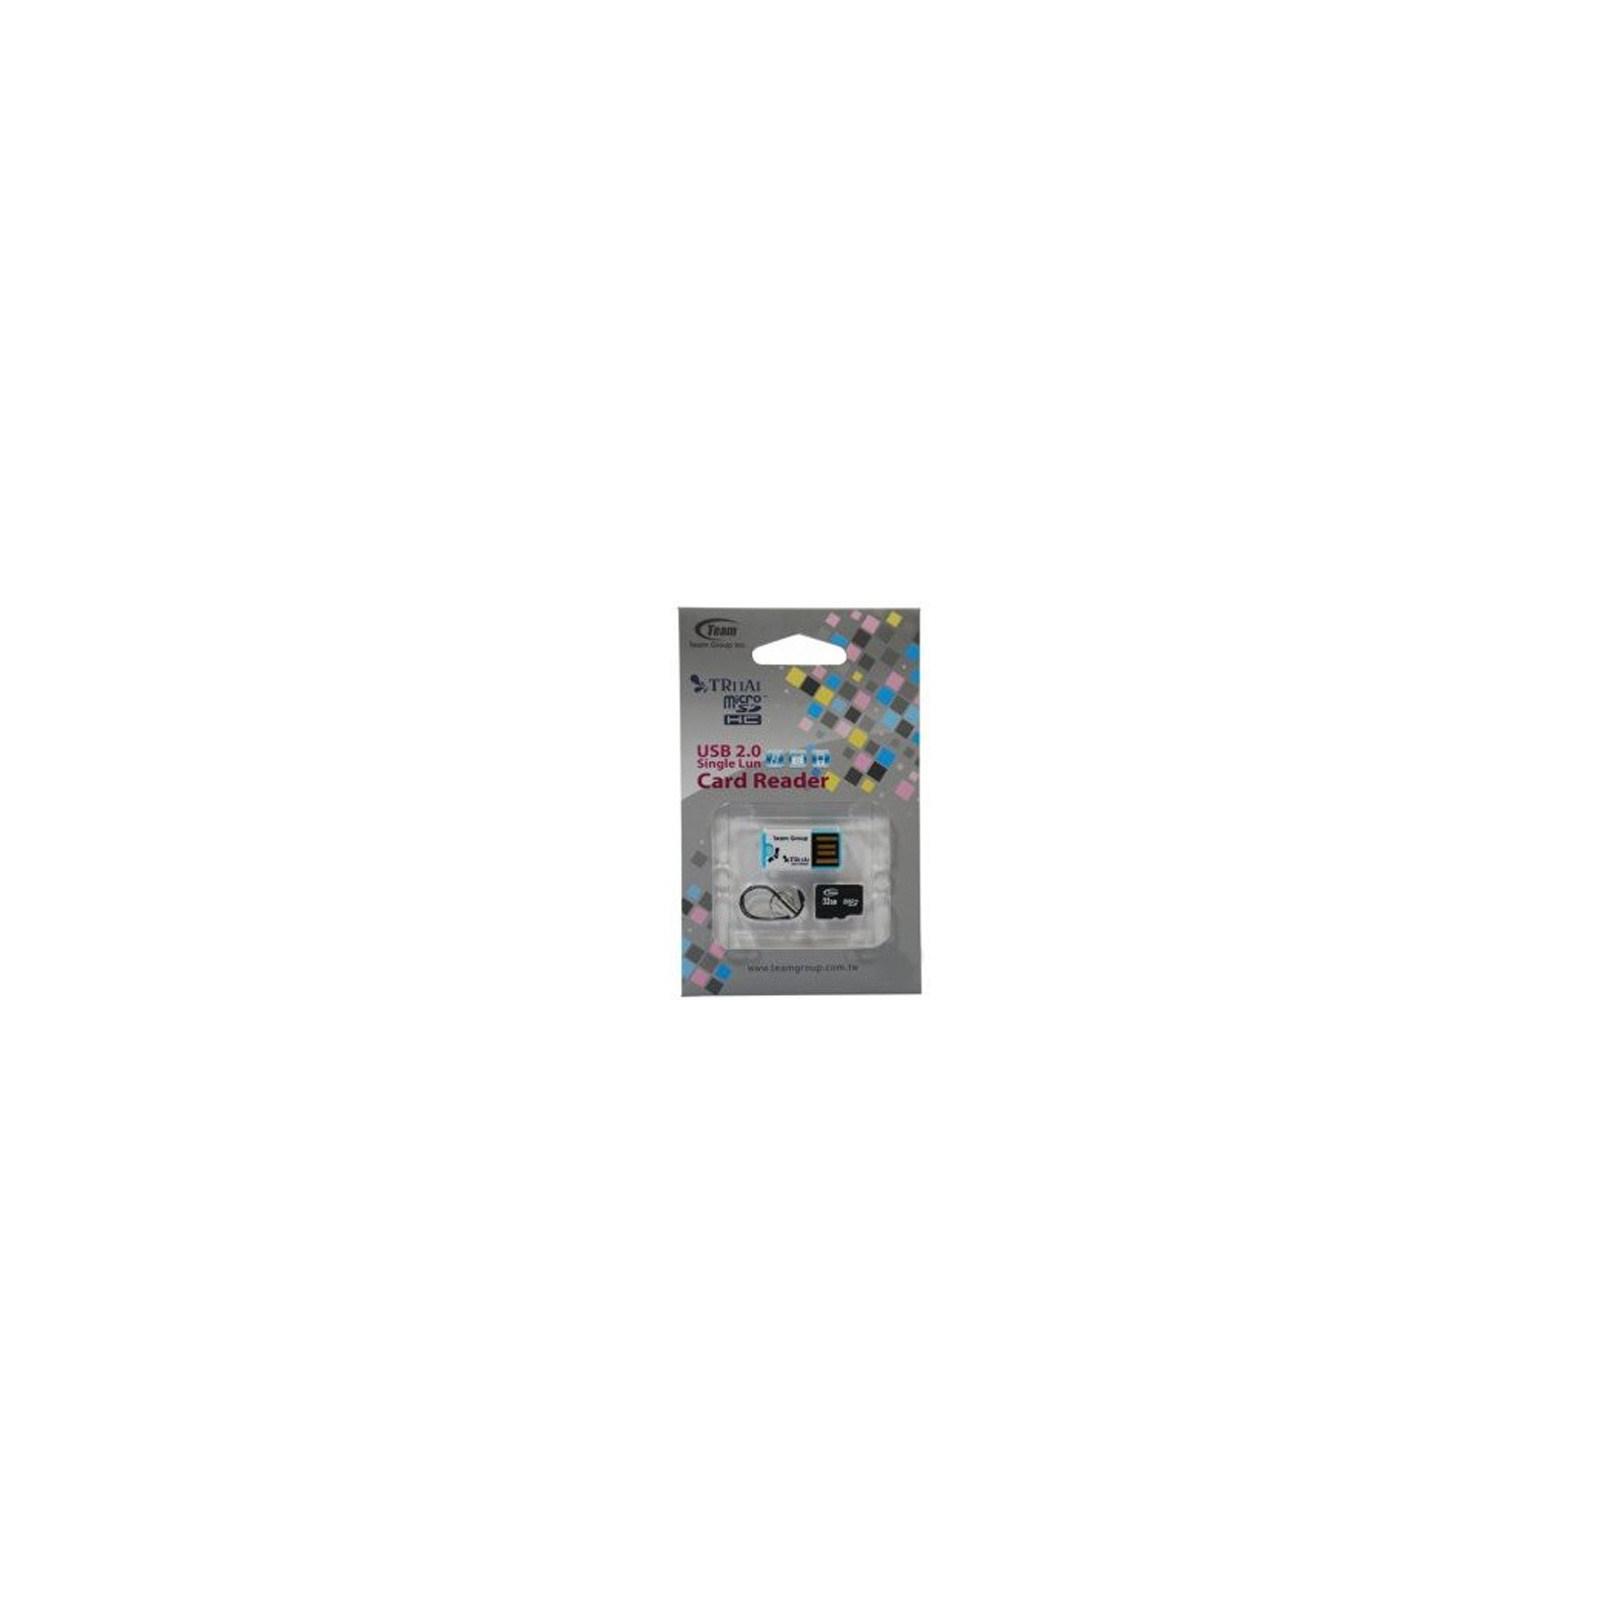 Карта памяти Team 32Gb microSDHC class 4 w/reader TR11A1 (TUSDH32GCL405)